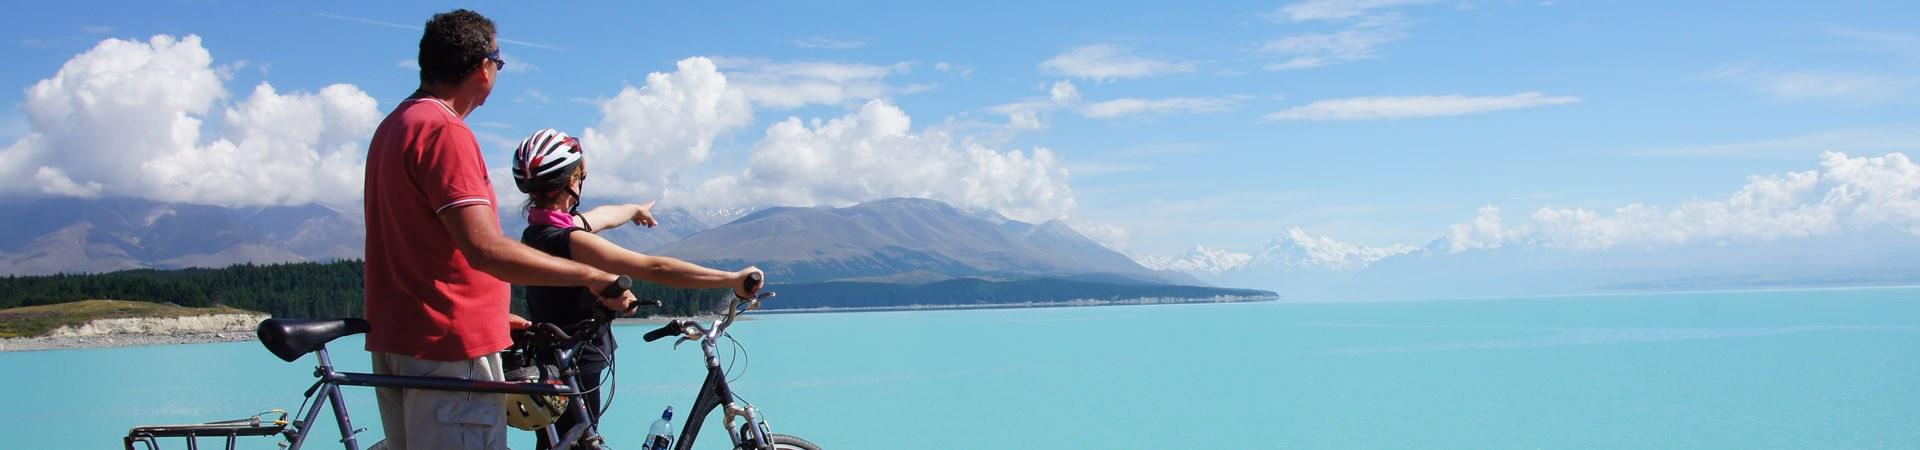 Radreise Neuseeland